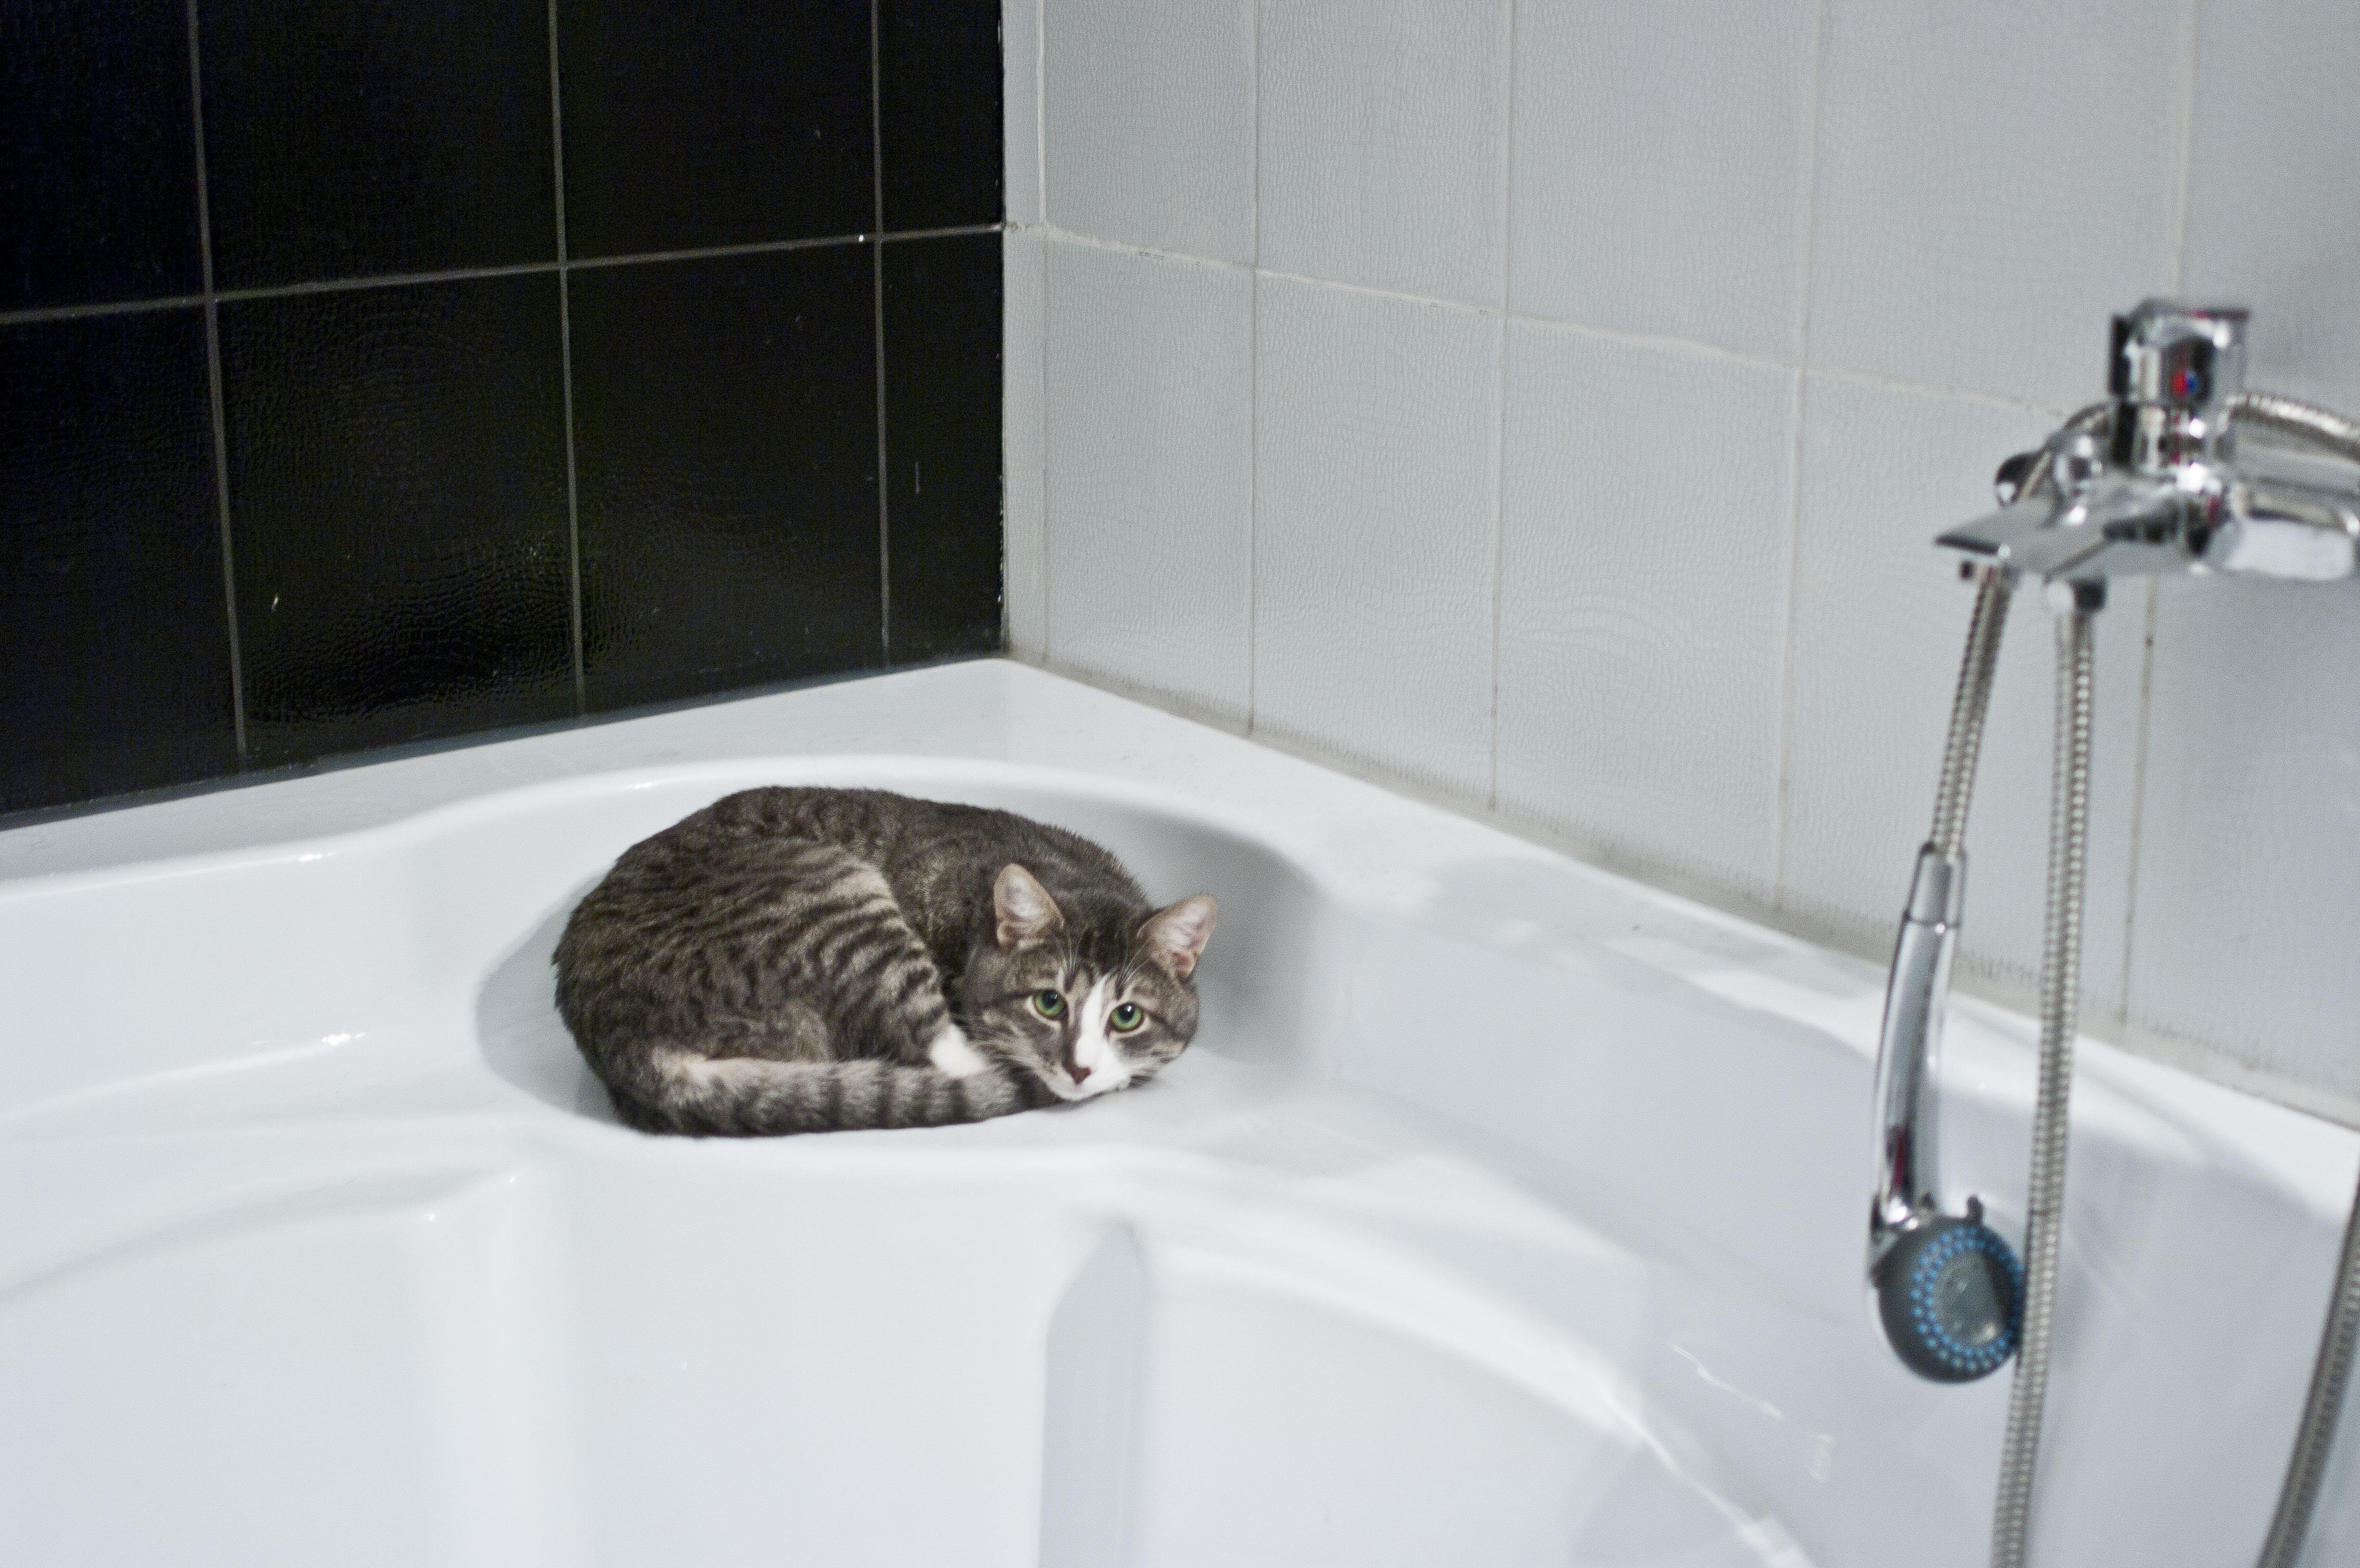 Fotos Gratis Piso Gato Lavabo Habitaci N Ba O Grifo  ~ Como Limpiar La Alcachofa De La Ducha